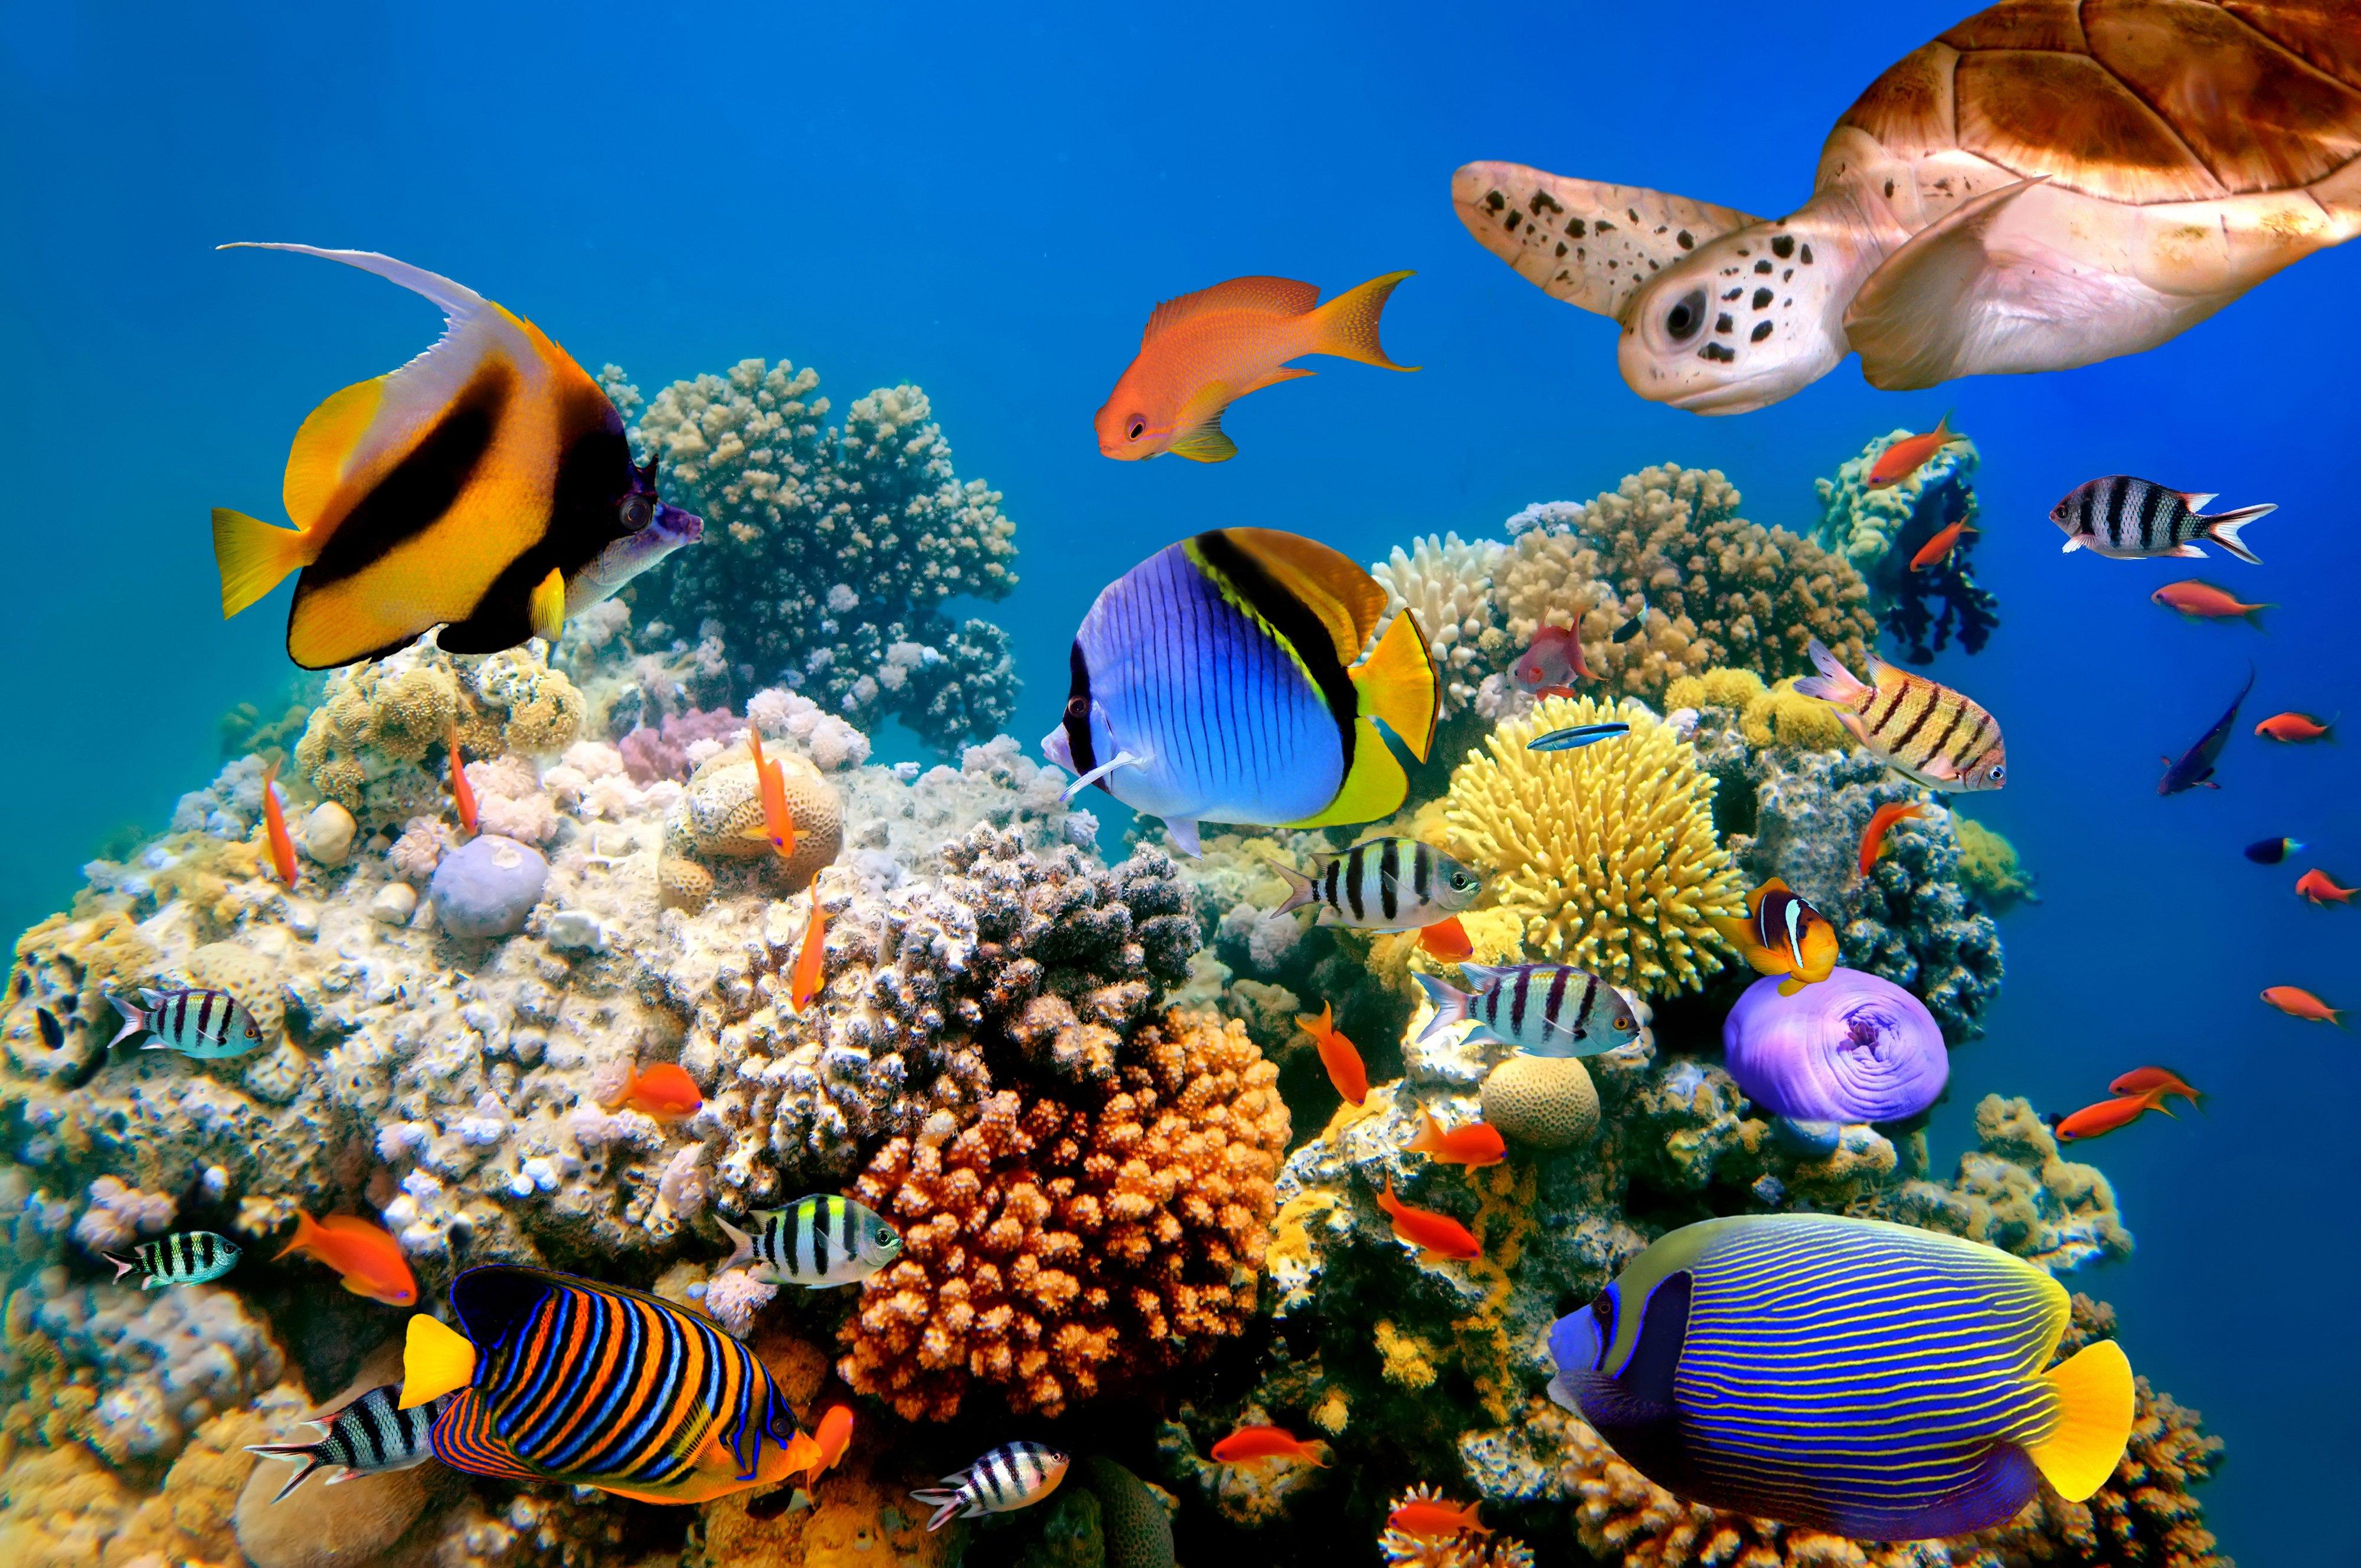 fish turtles corals tropical sea ocean coral reef wallpaper background 4000x2657